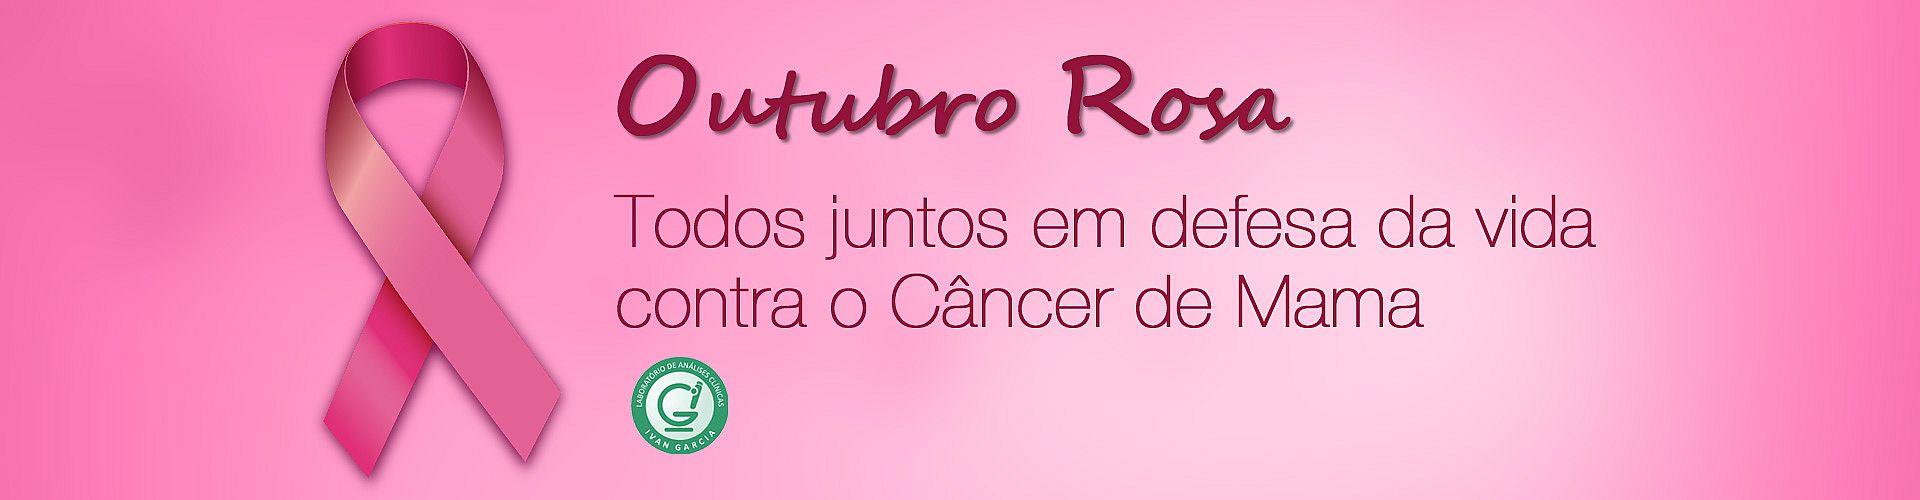 Outubro Rosa 2014 - Laboratório Ivan Garcia